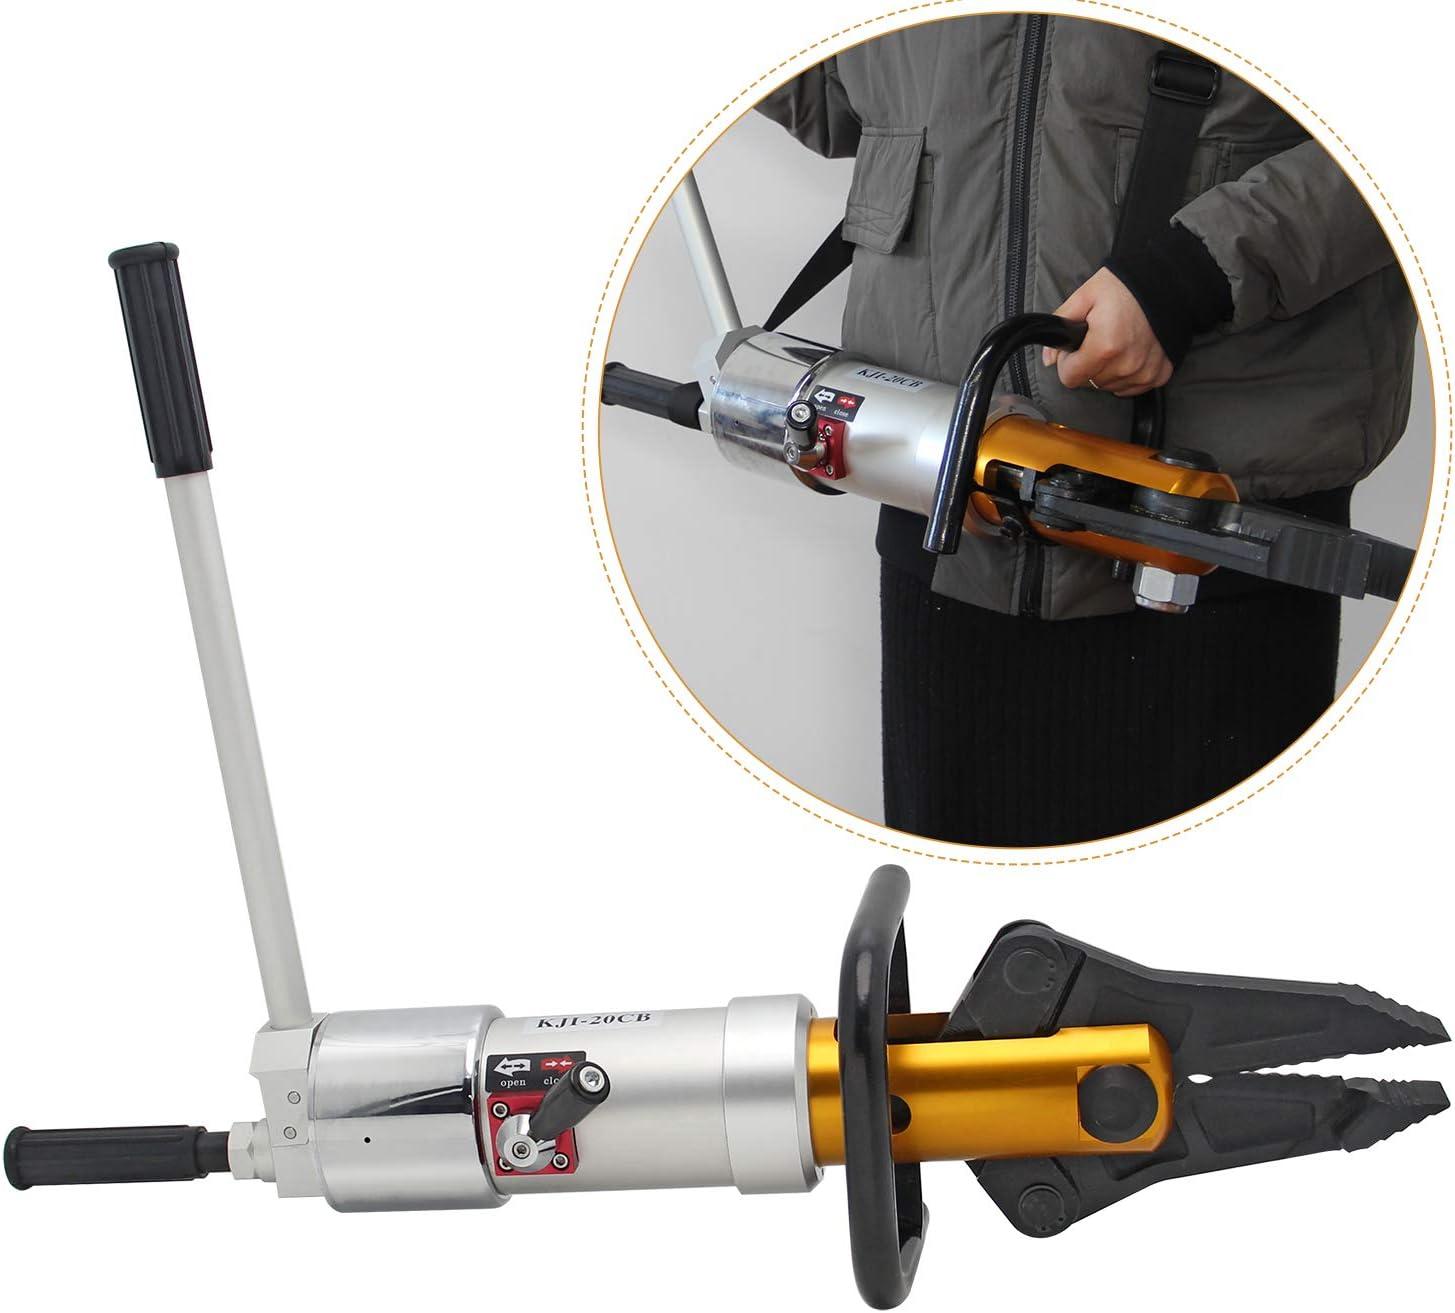 Bonvoisin Multi-functional Hydraulic Flange Spreader/Cutter/Clam